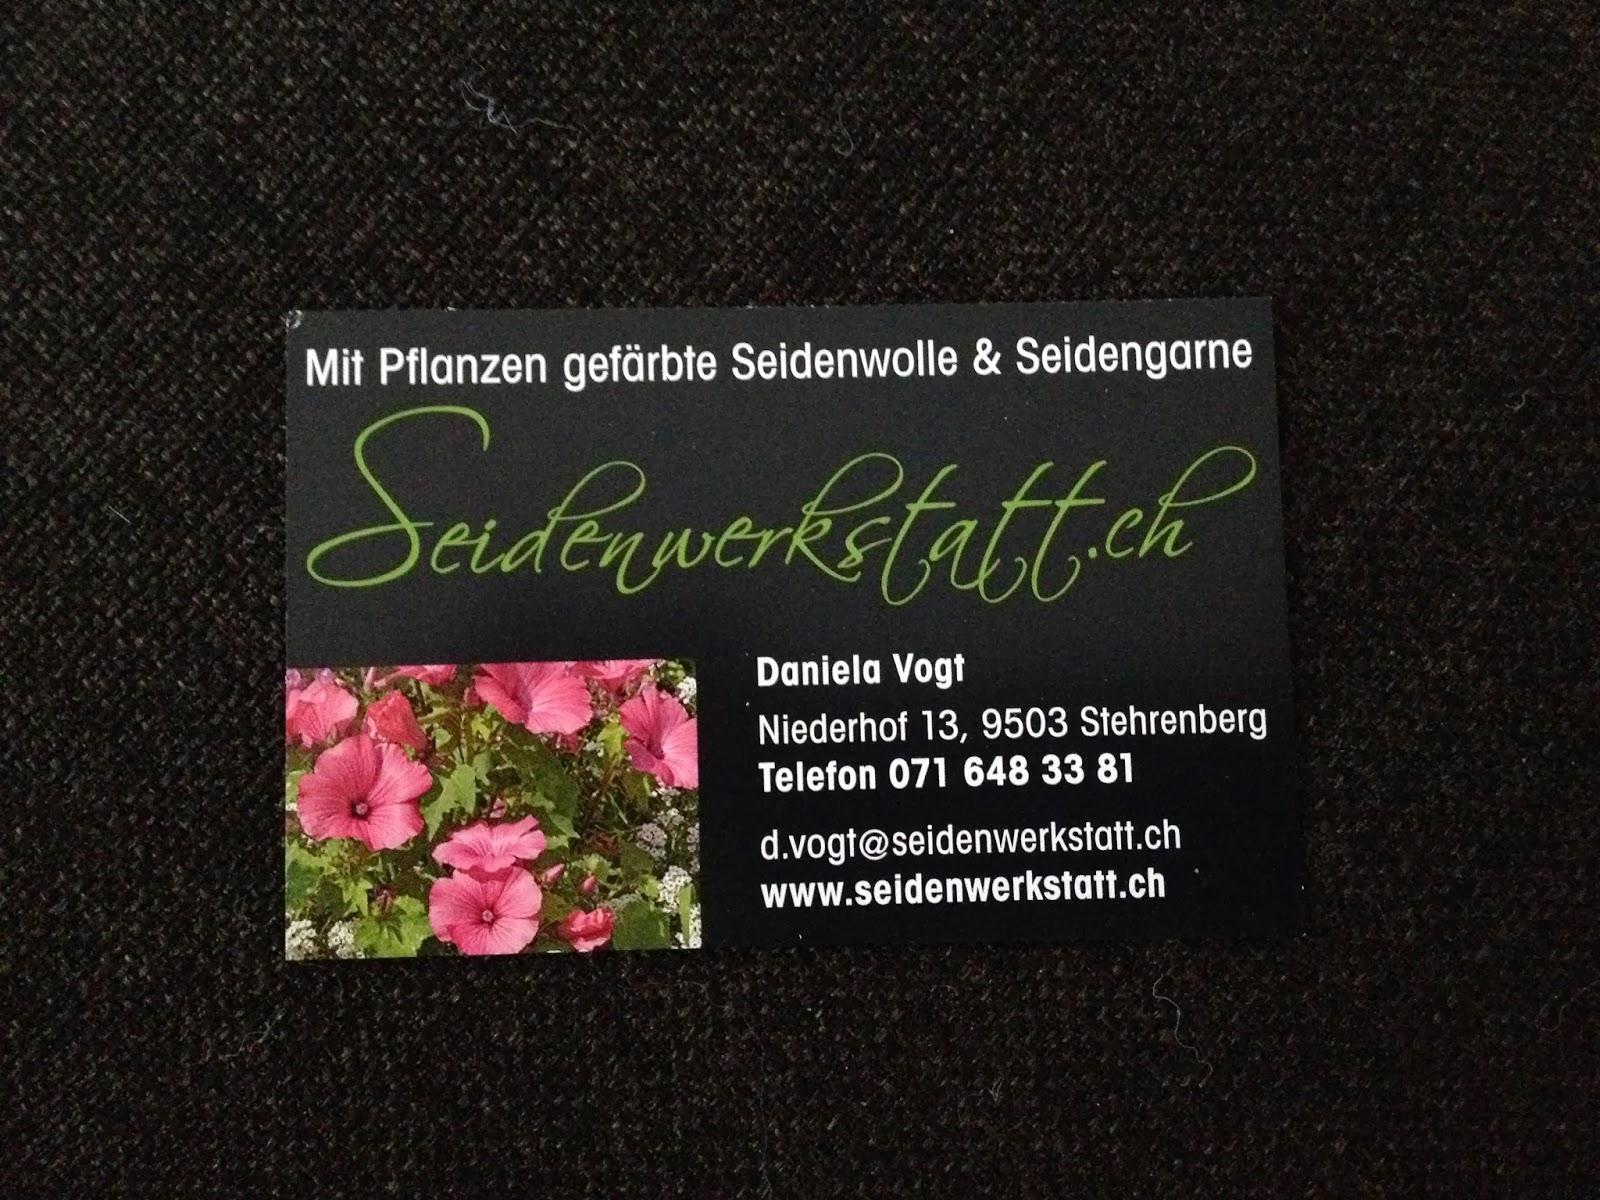 http://www.seidenwerkstatt.ch/